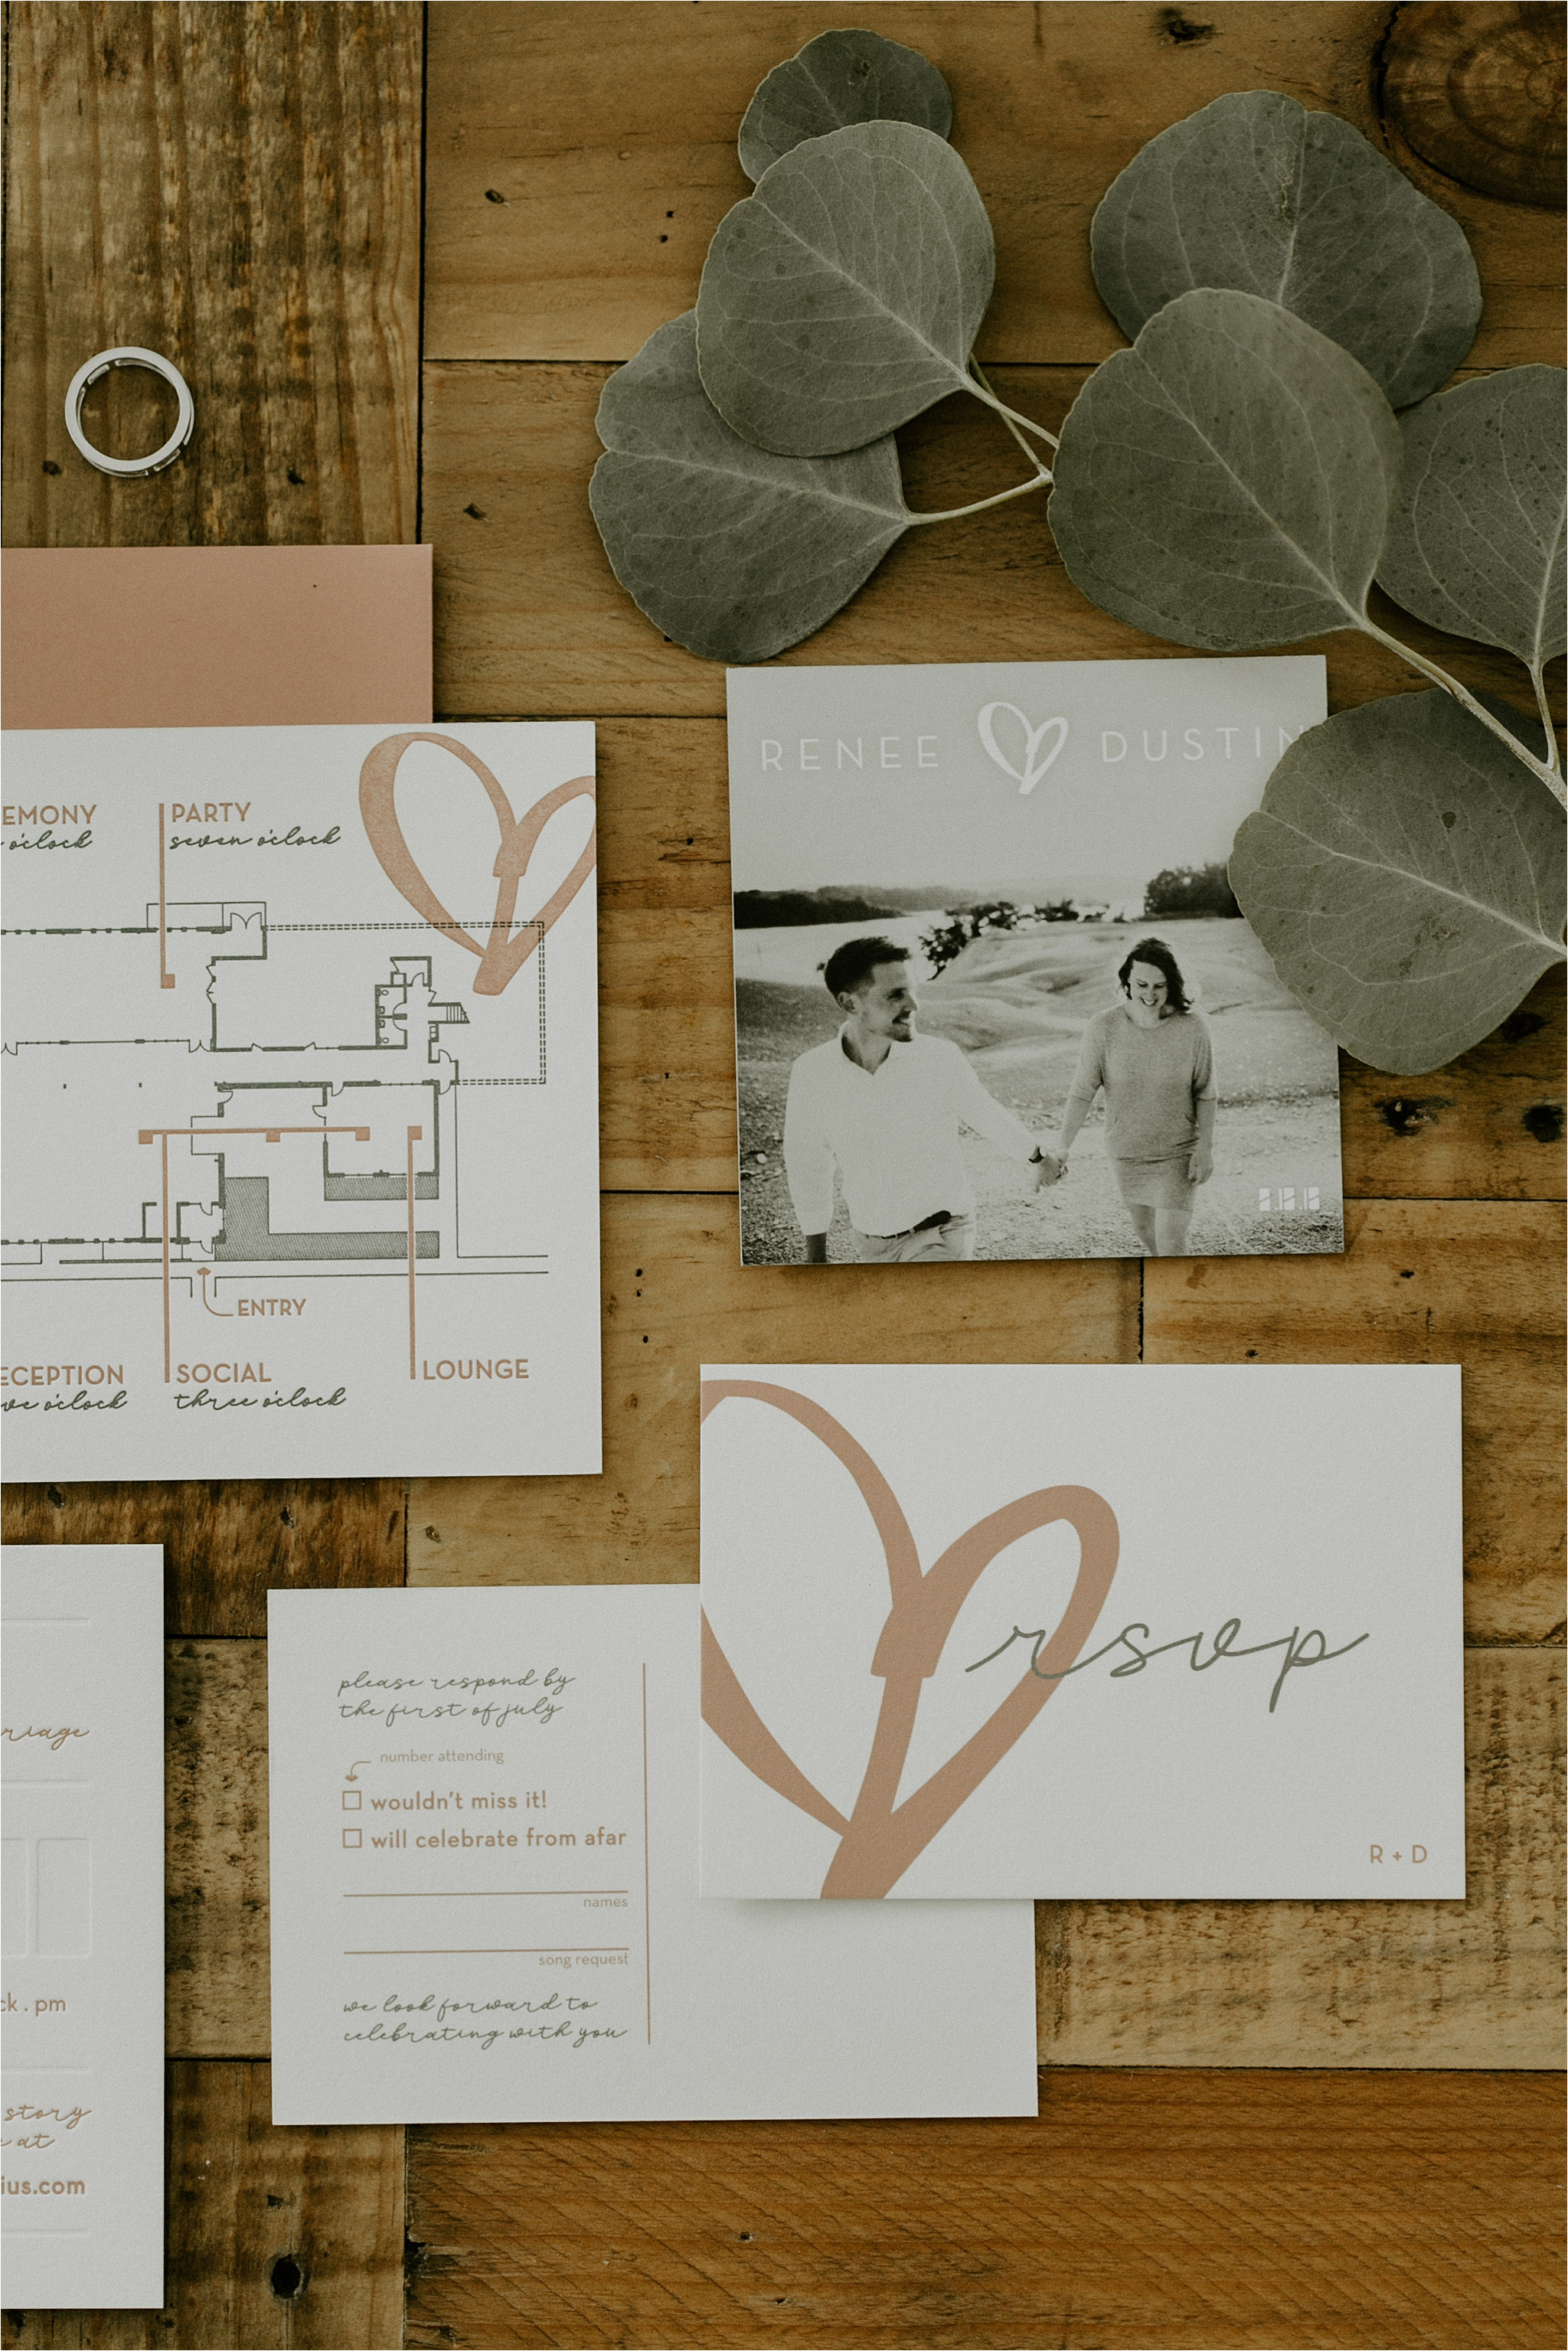 Renee_+_Dustin_-_Supply_Wedding-_0002.jpg